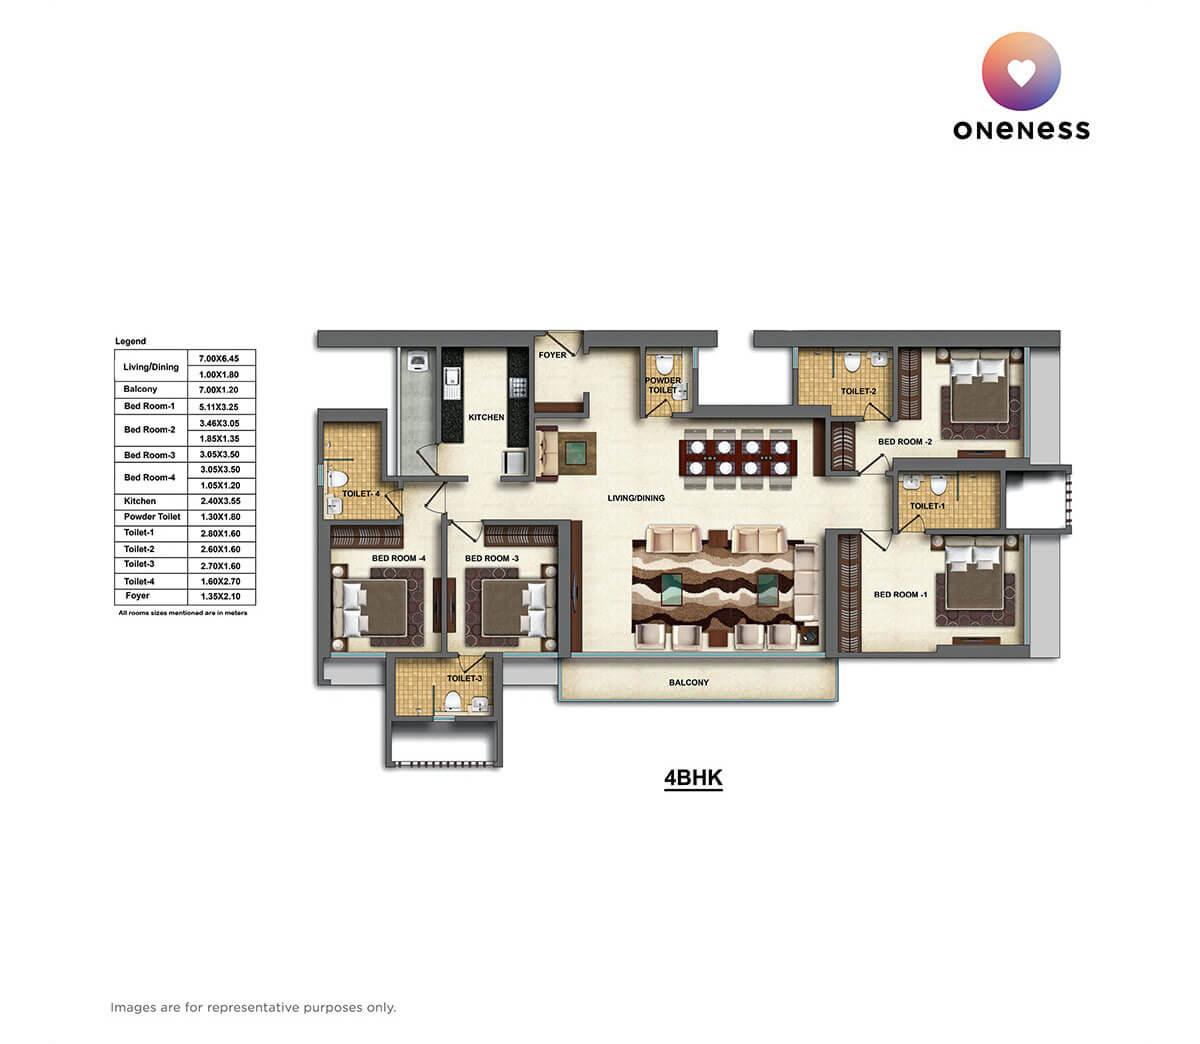 dheeraj oneness apartment 4bhk 1670sqft 1